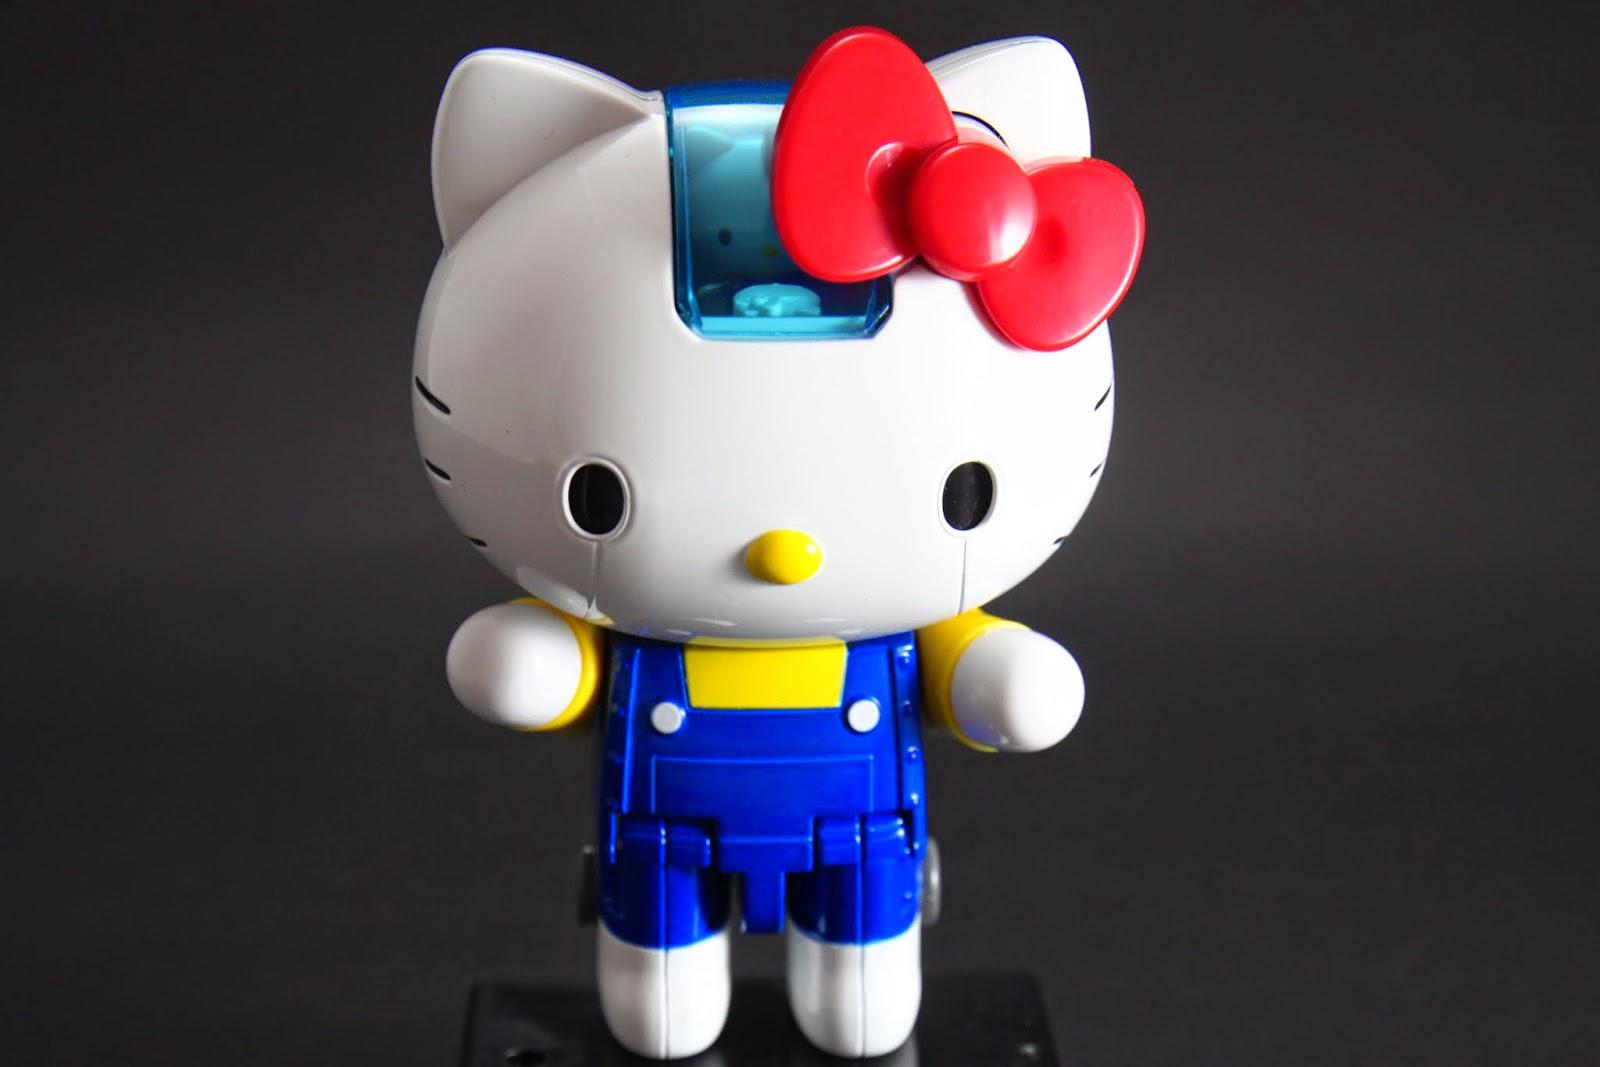 Kitty坐進Kitty號了!